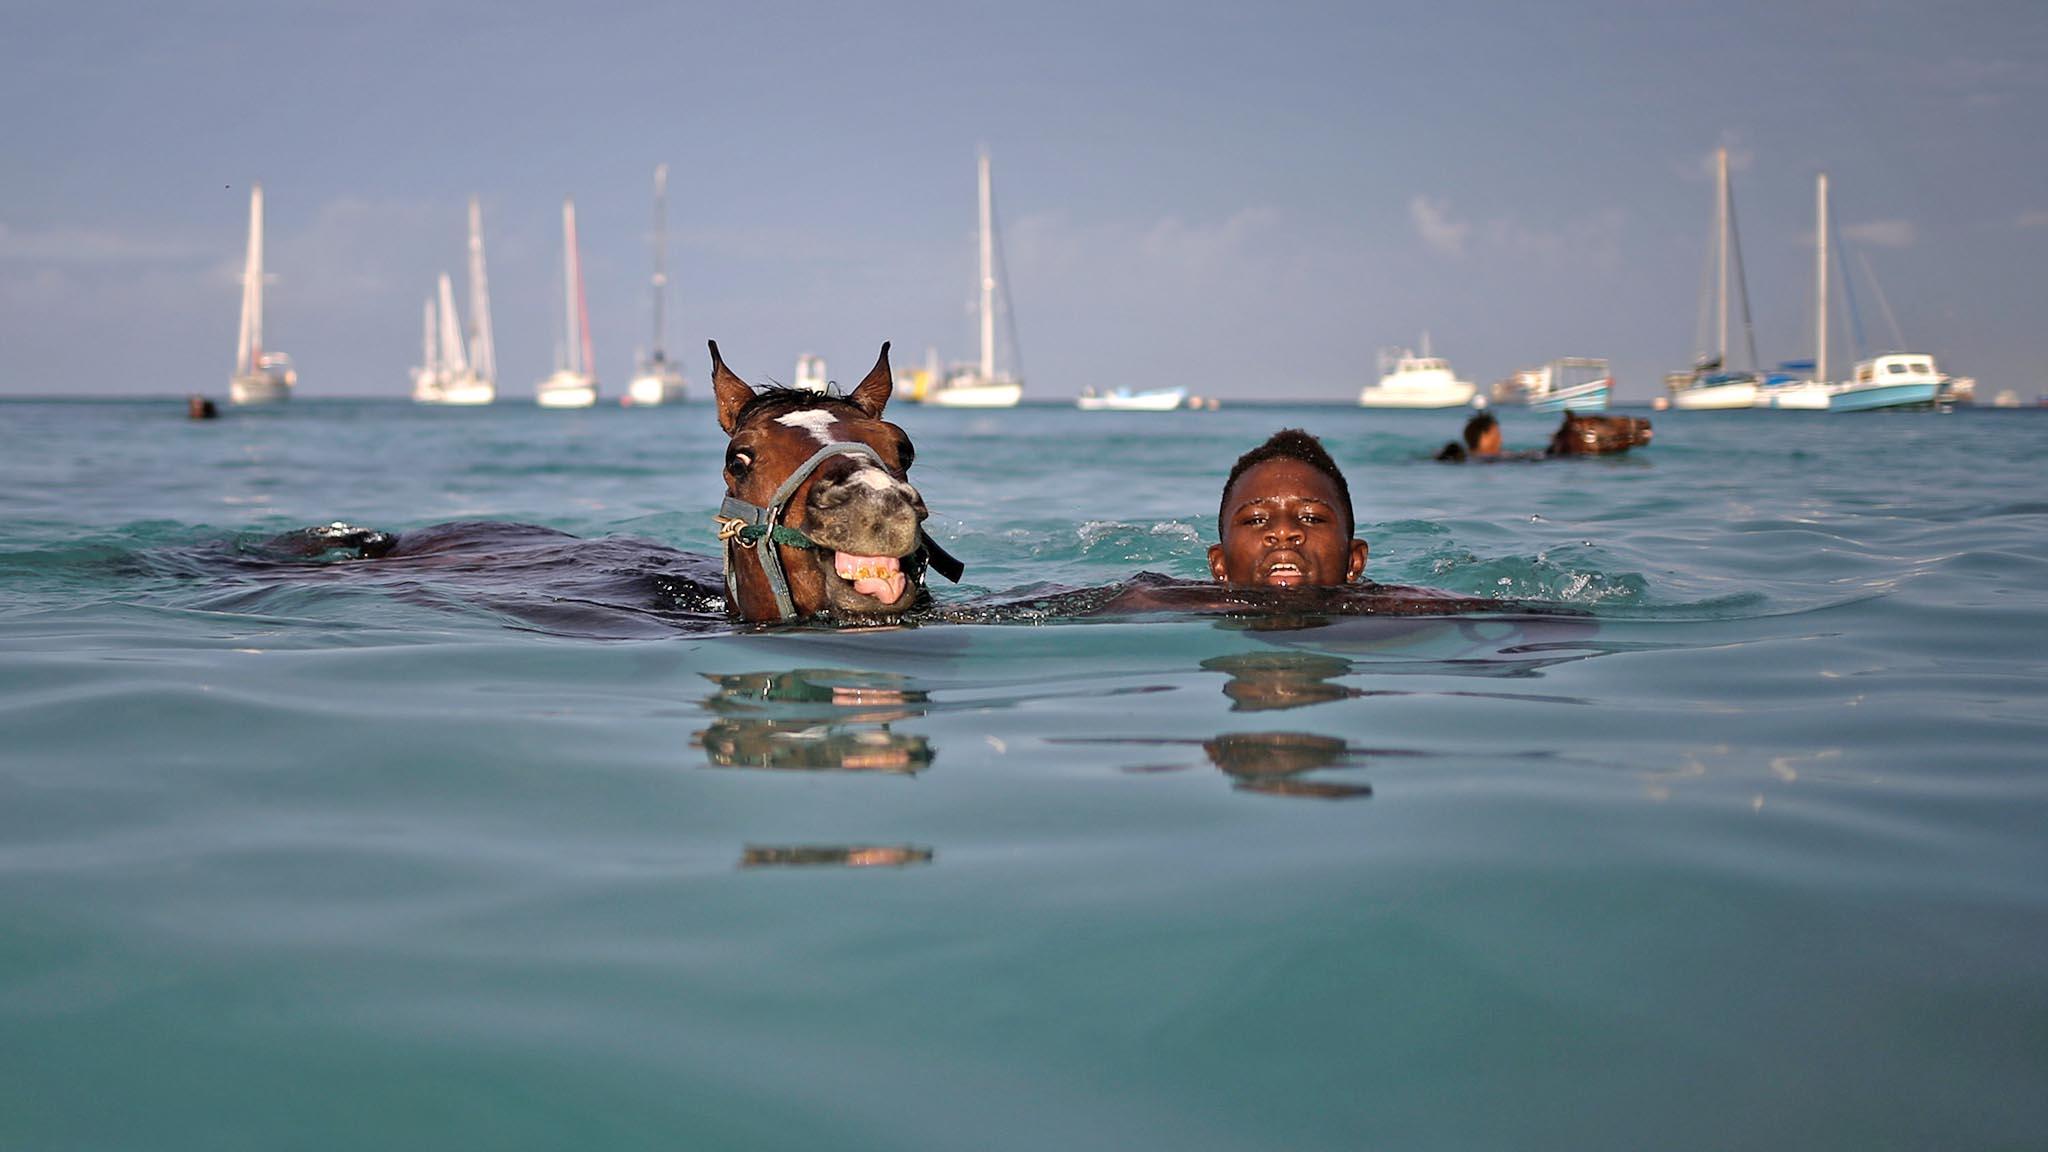 A handler swims with a horse from the Garrison Savannah in the Caribbean Sea near Bridgetown, Barbados